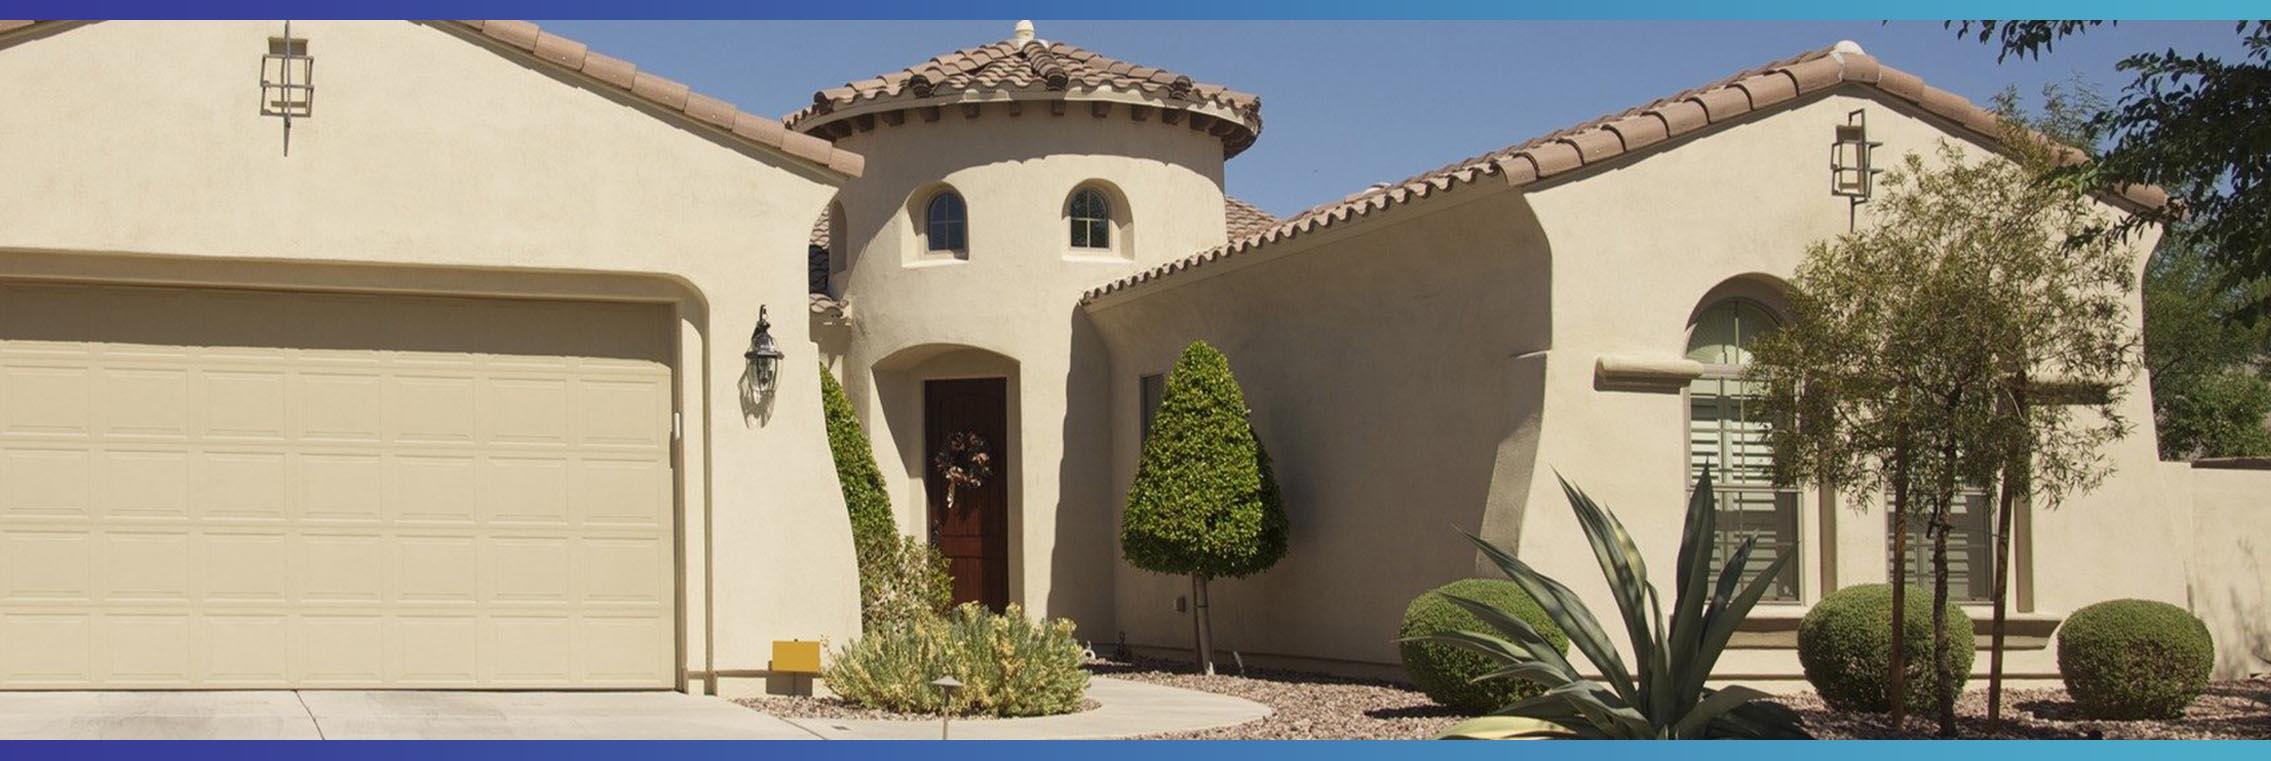 Header image - Fiberglass window replacements in Scottsdale and Phoenix